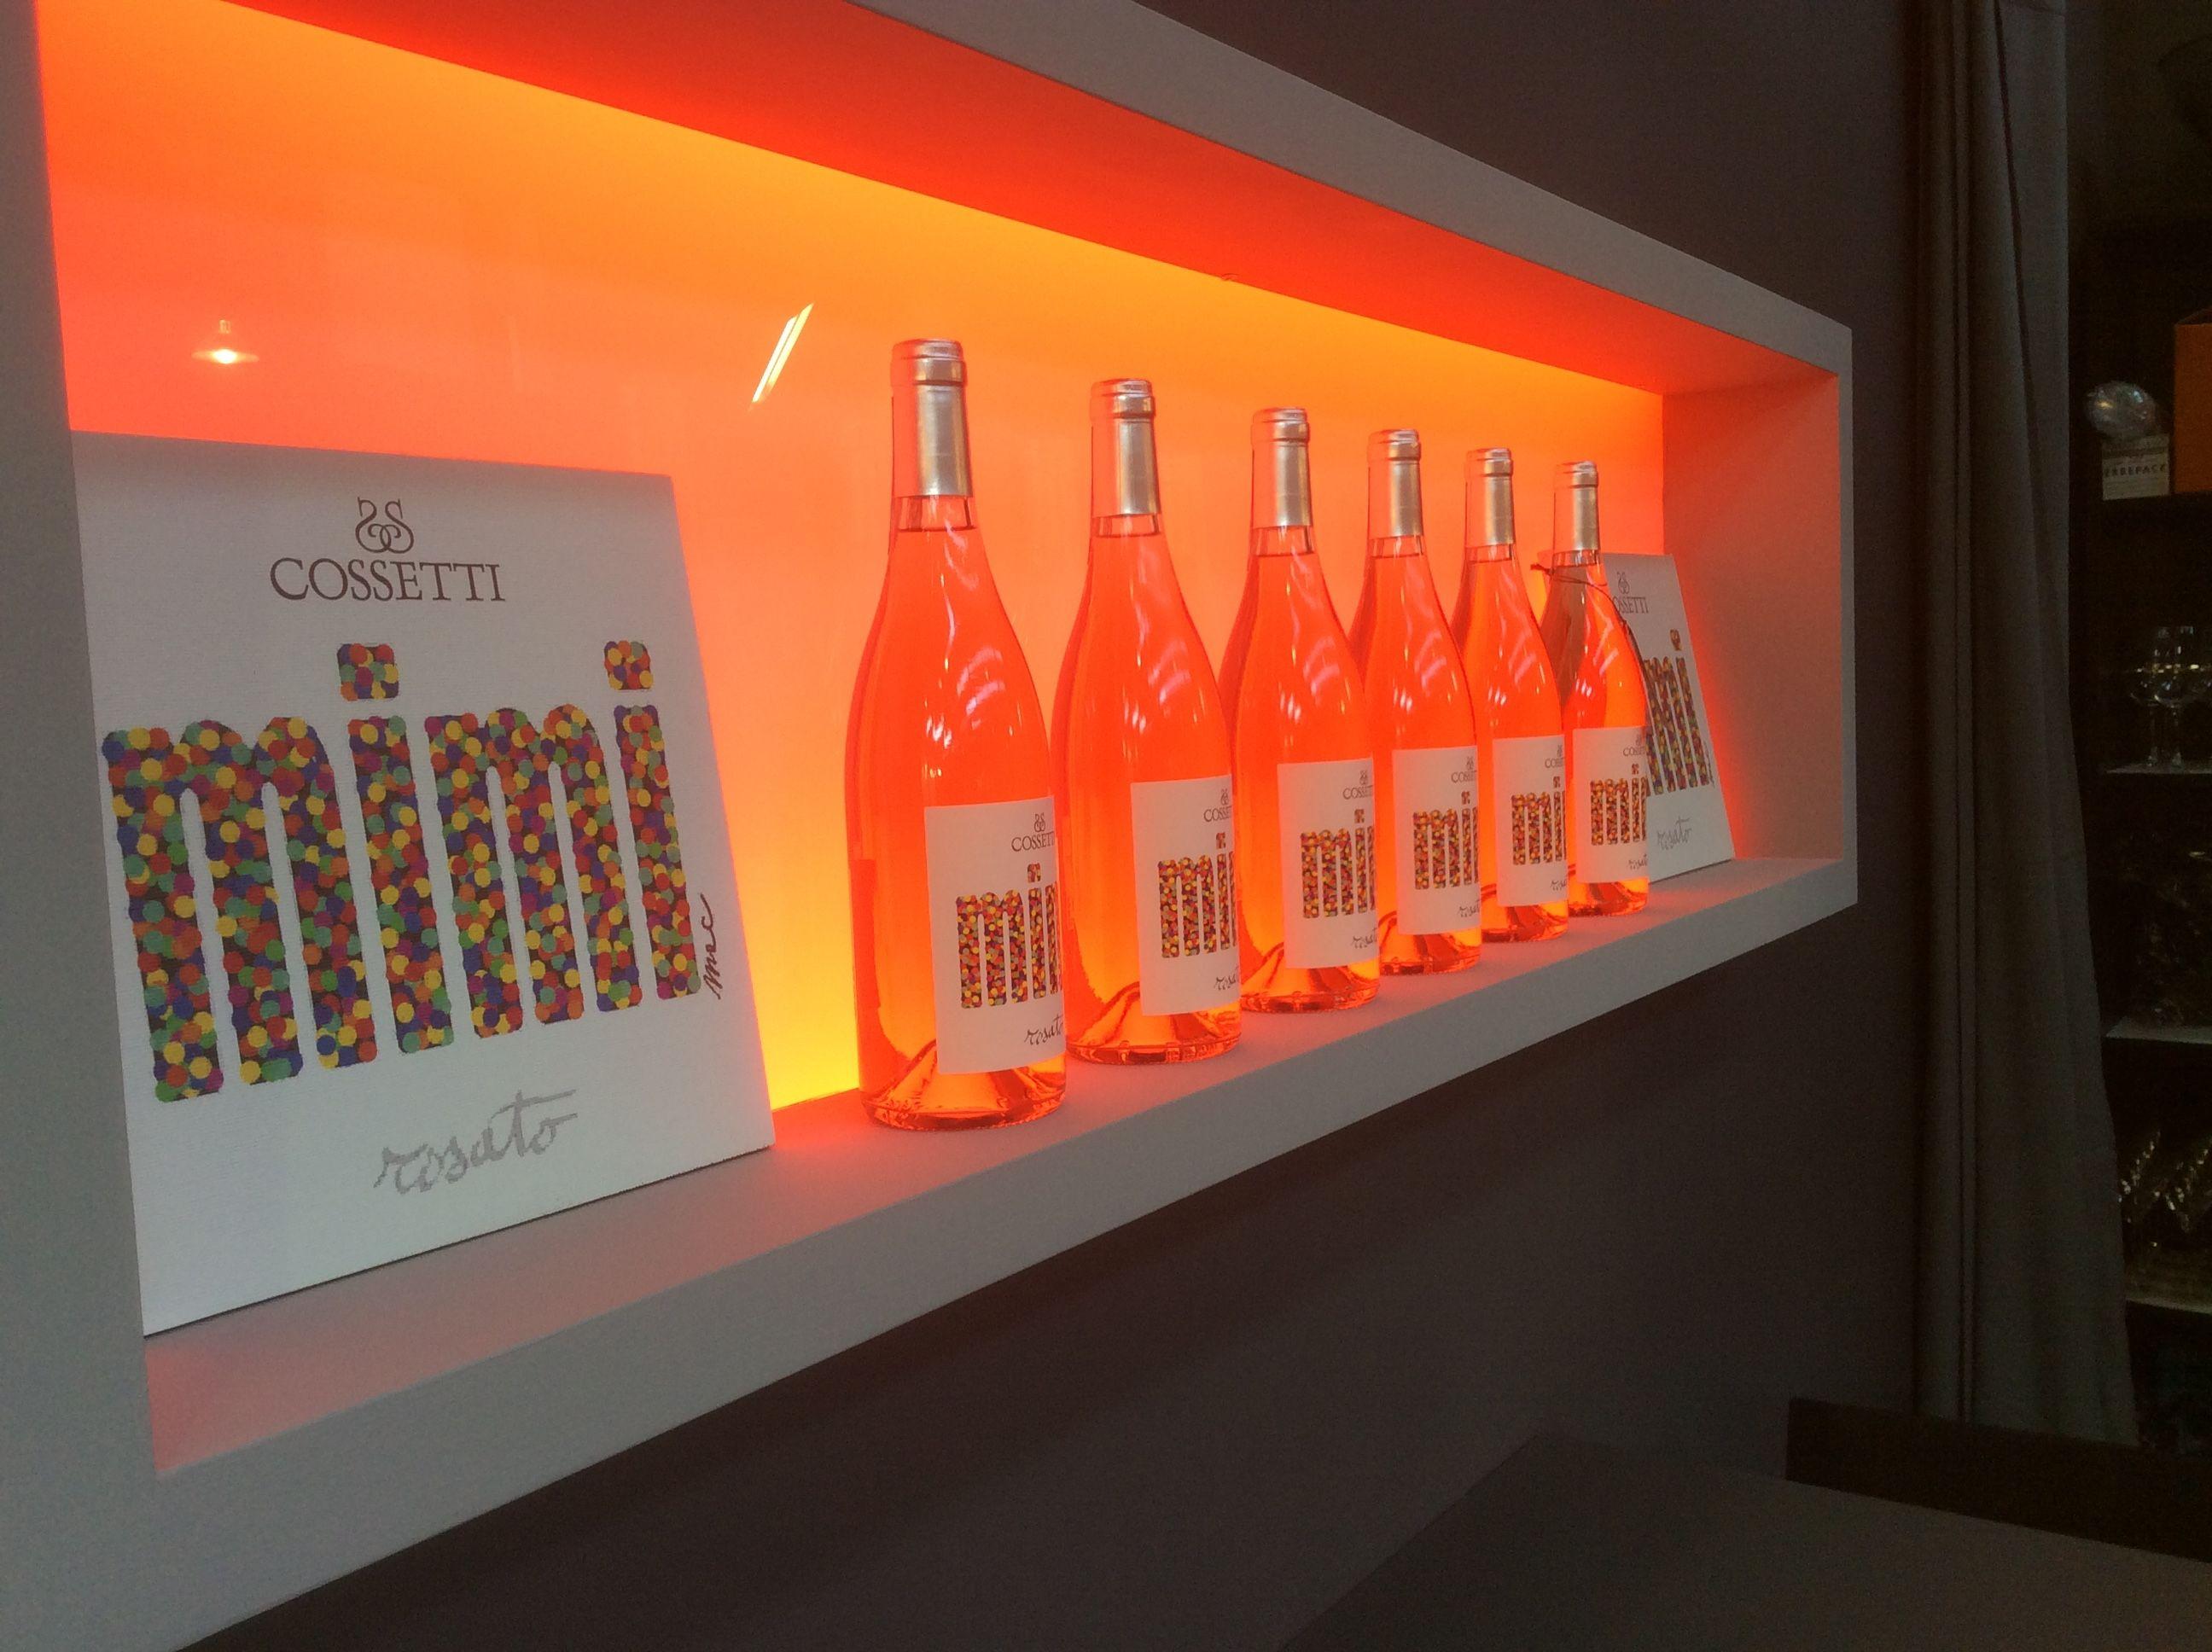 Mimi Rosato Piemonte | Marco Brussolo Wein Import /Export....Gollier ...